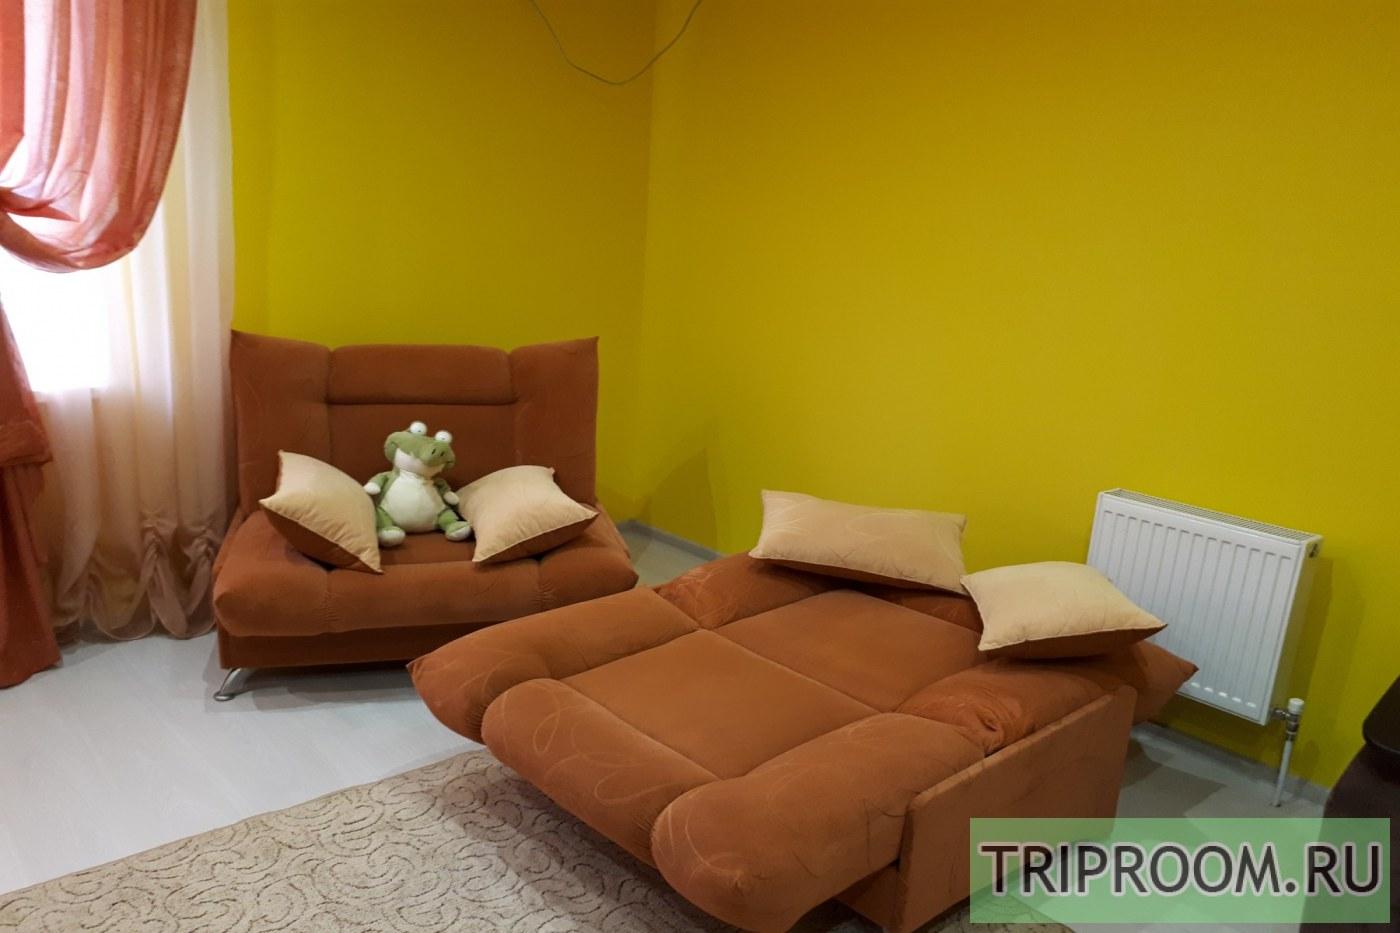 2-комнатная квартира посуточно (вариант № 39032), ул. Симиренко улица, фото № 5